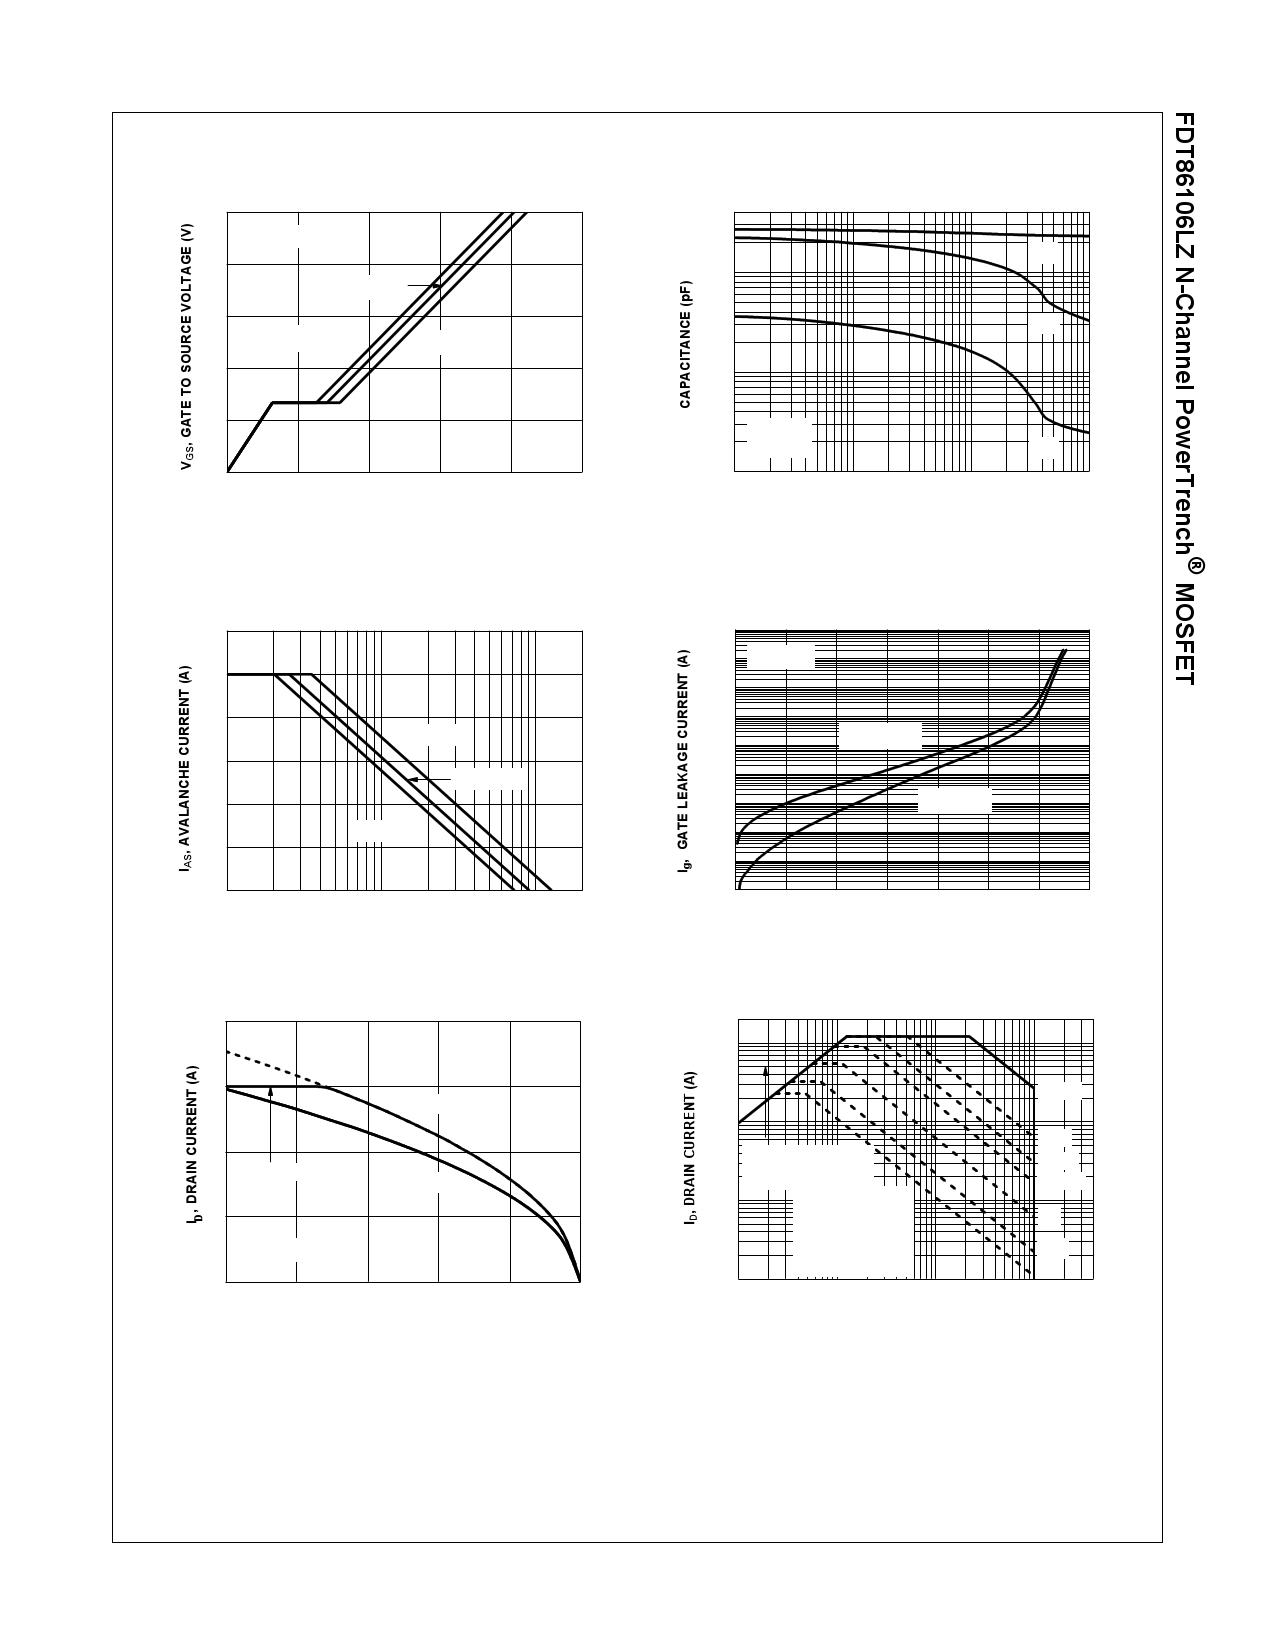 FDT86106LZ pdf, 반도체, 판매, 대치품